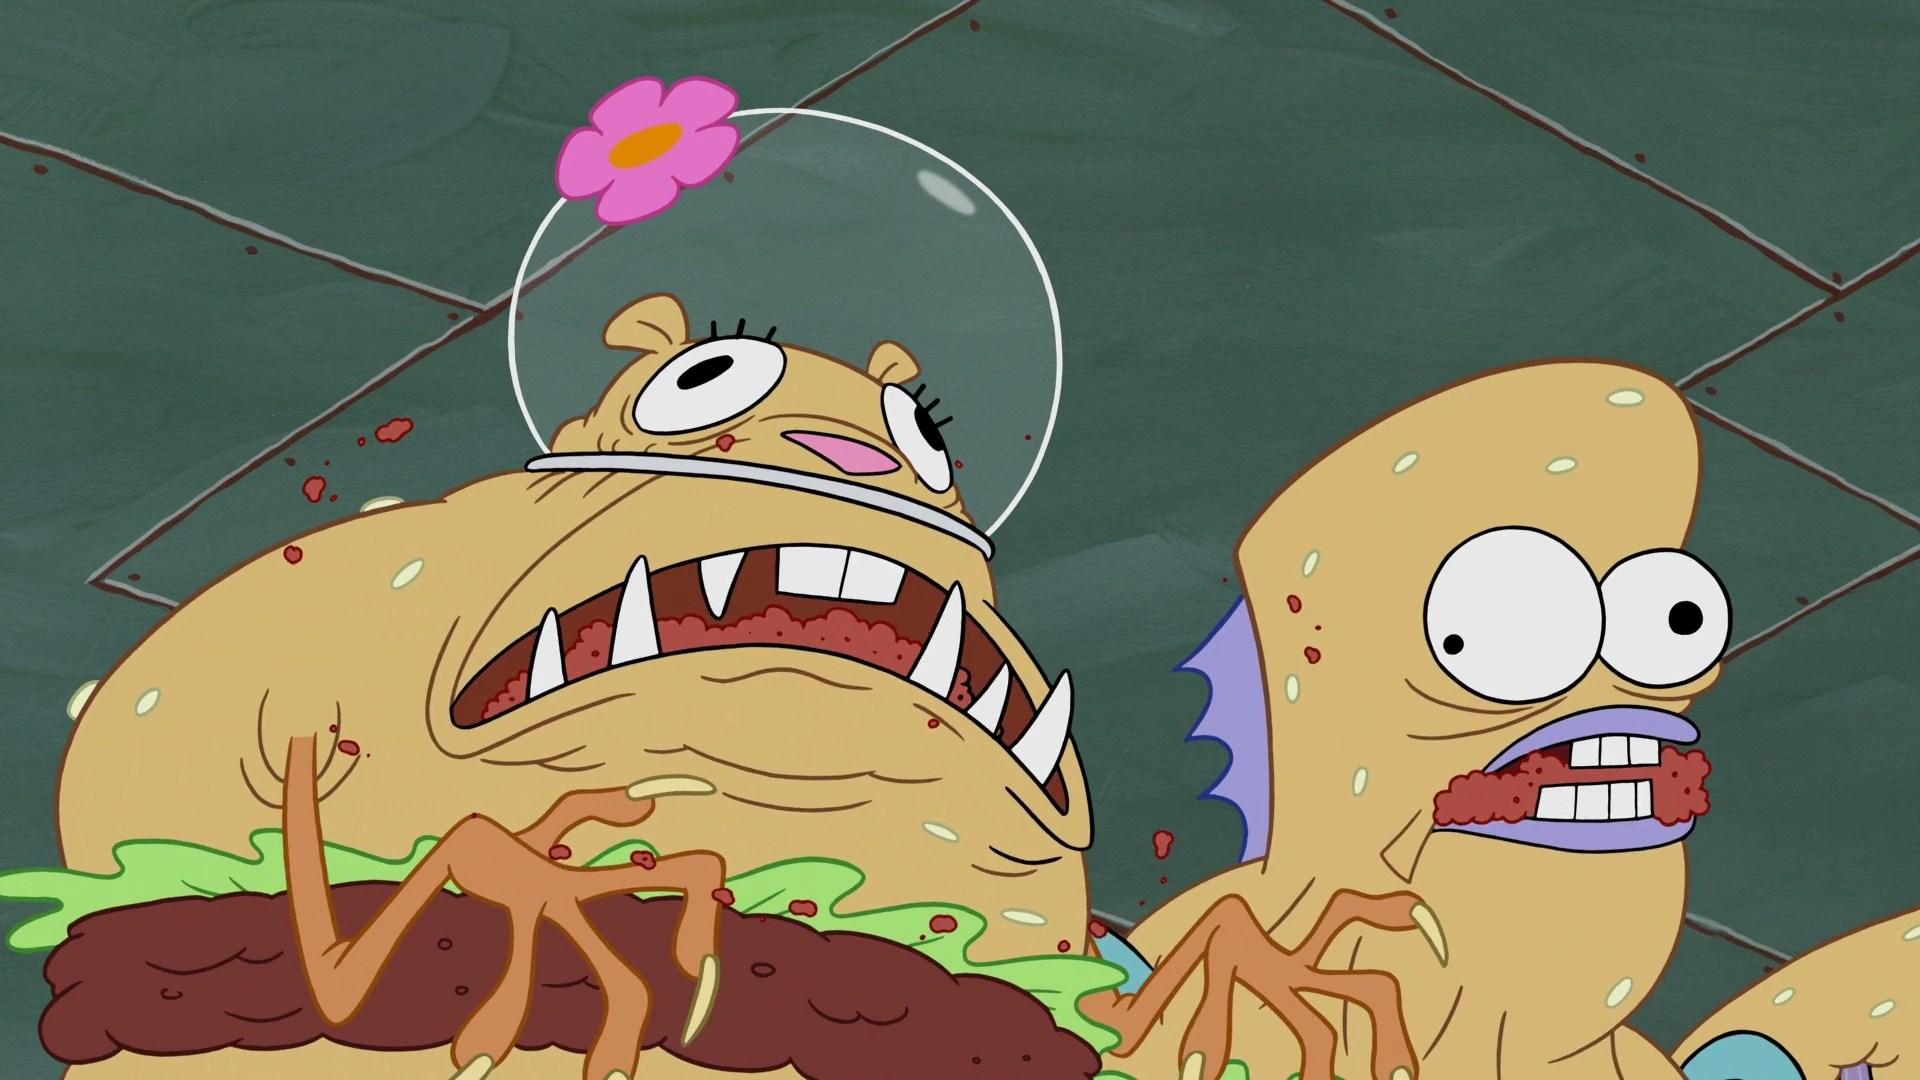 spongebob krabby patty creature feature episode